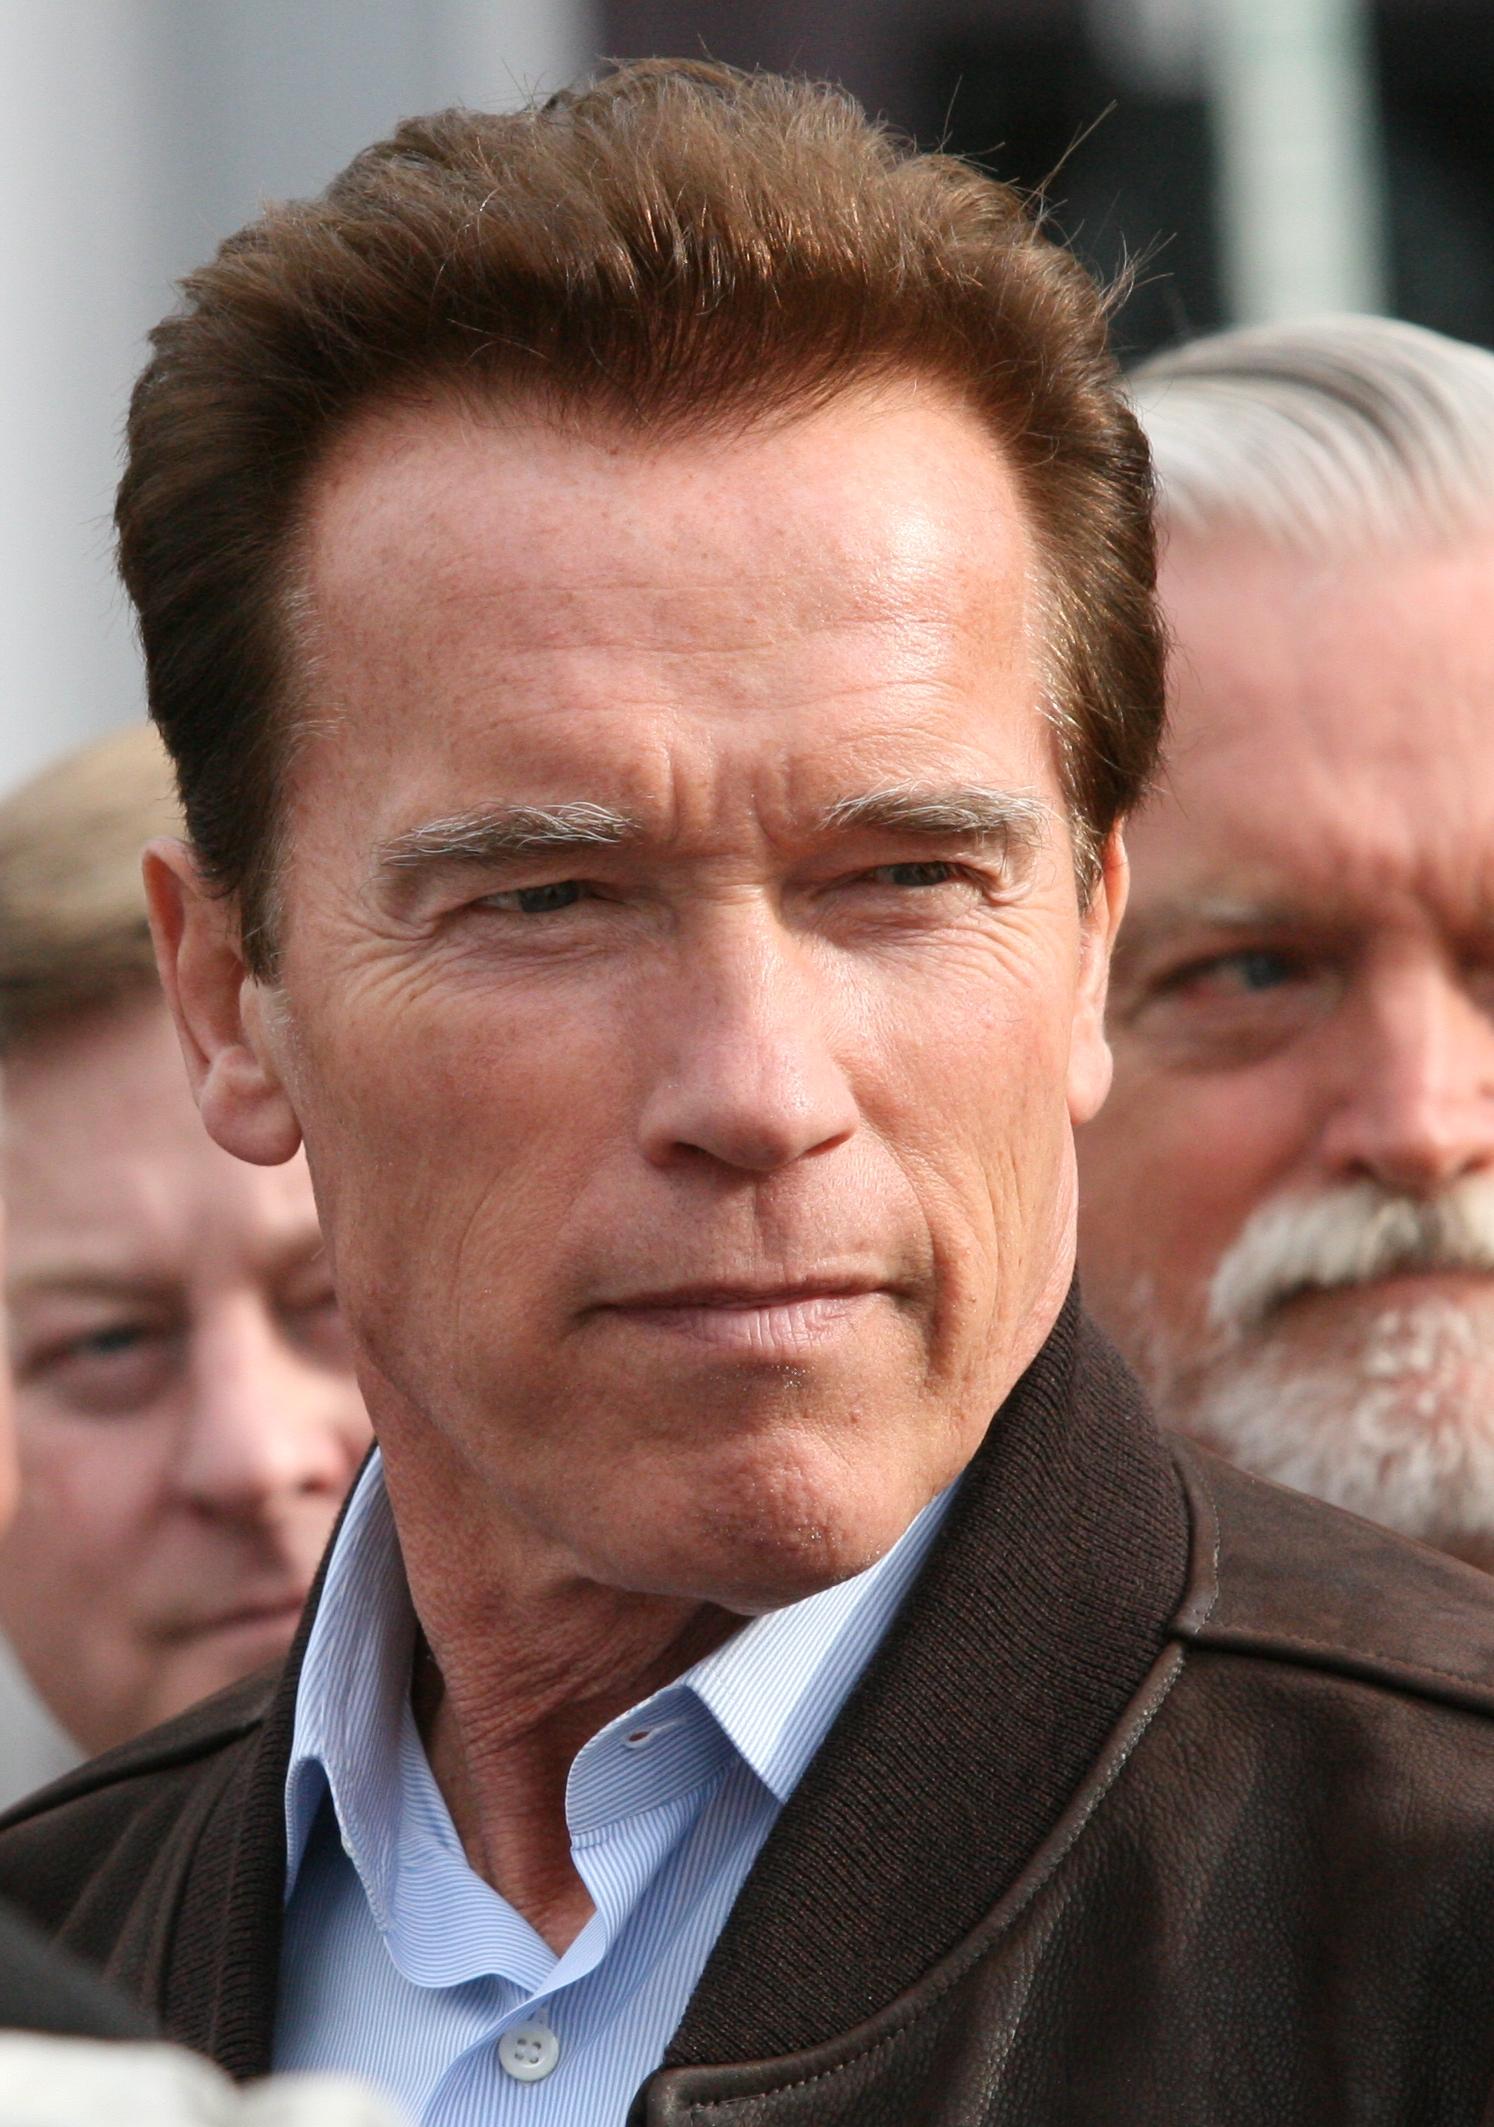 Arnold Schwarzenegger Soundboard 4 - Soundboard | eBaum's ...